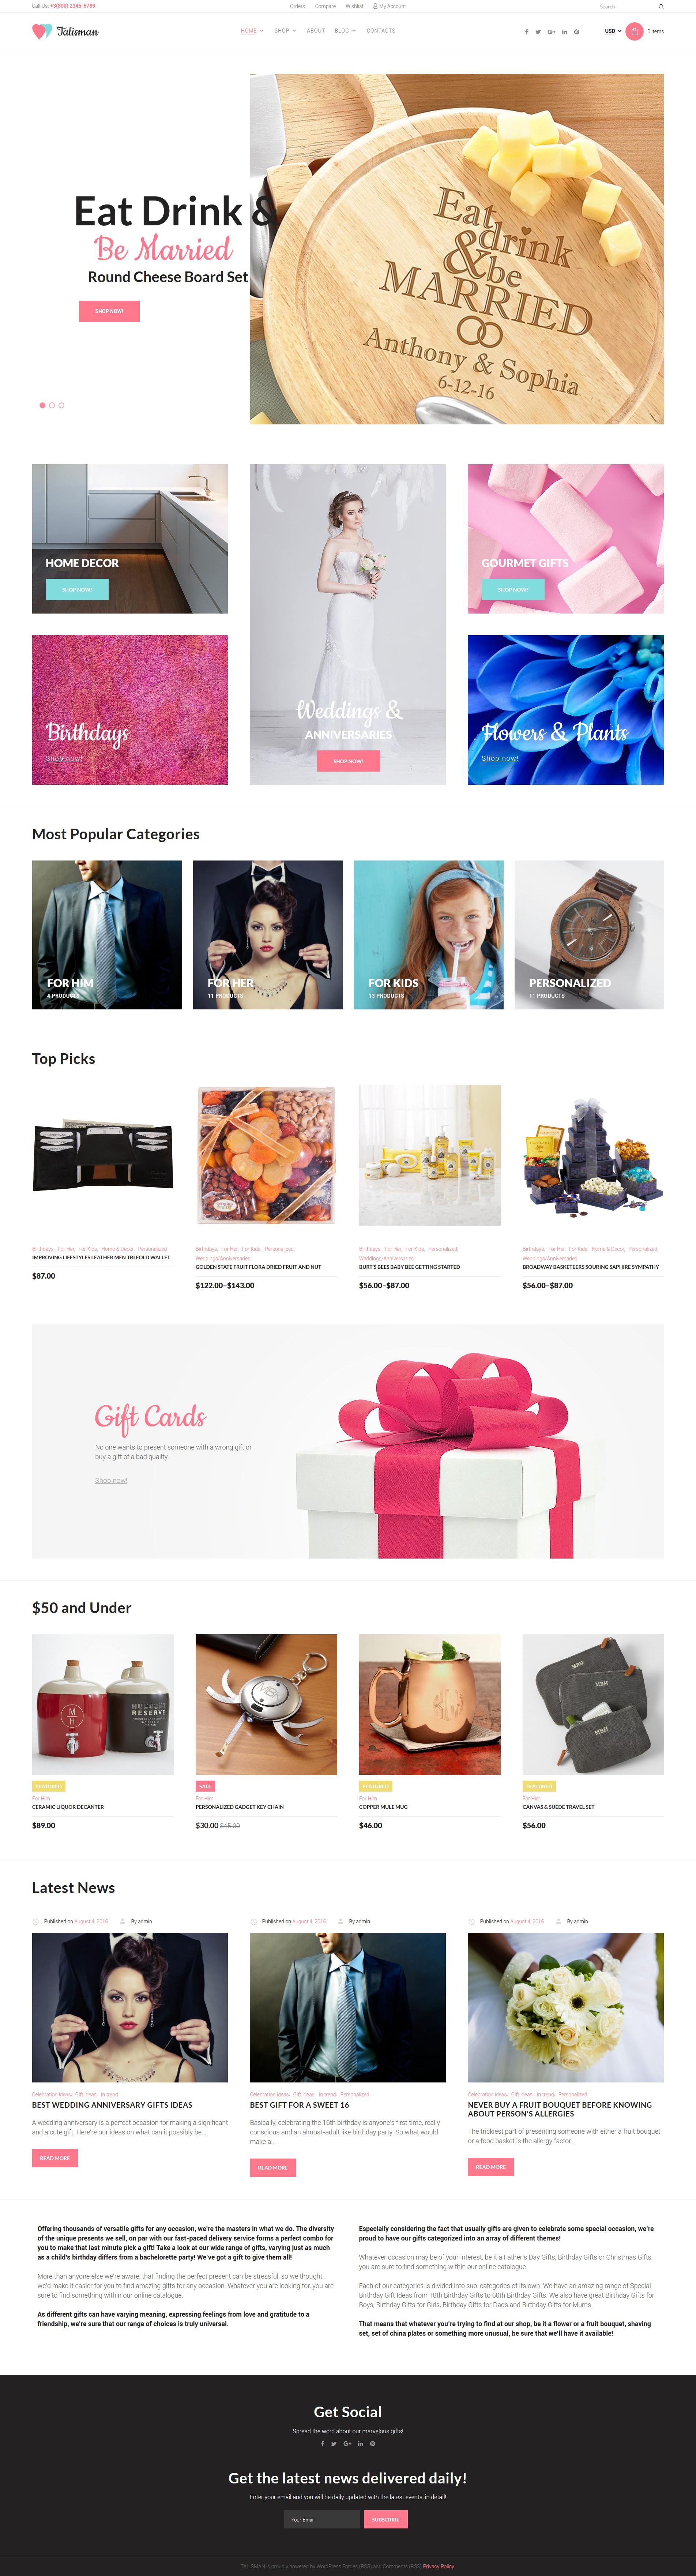 Talisman - Gifts Store Responsive WooCommerce Theme - screenshot